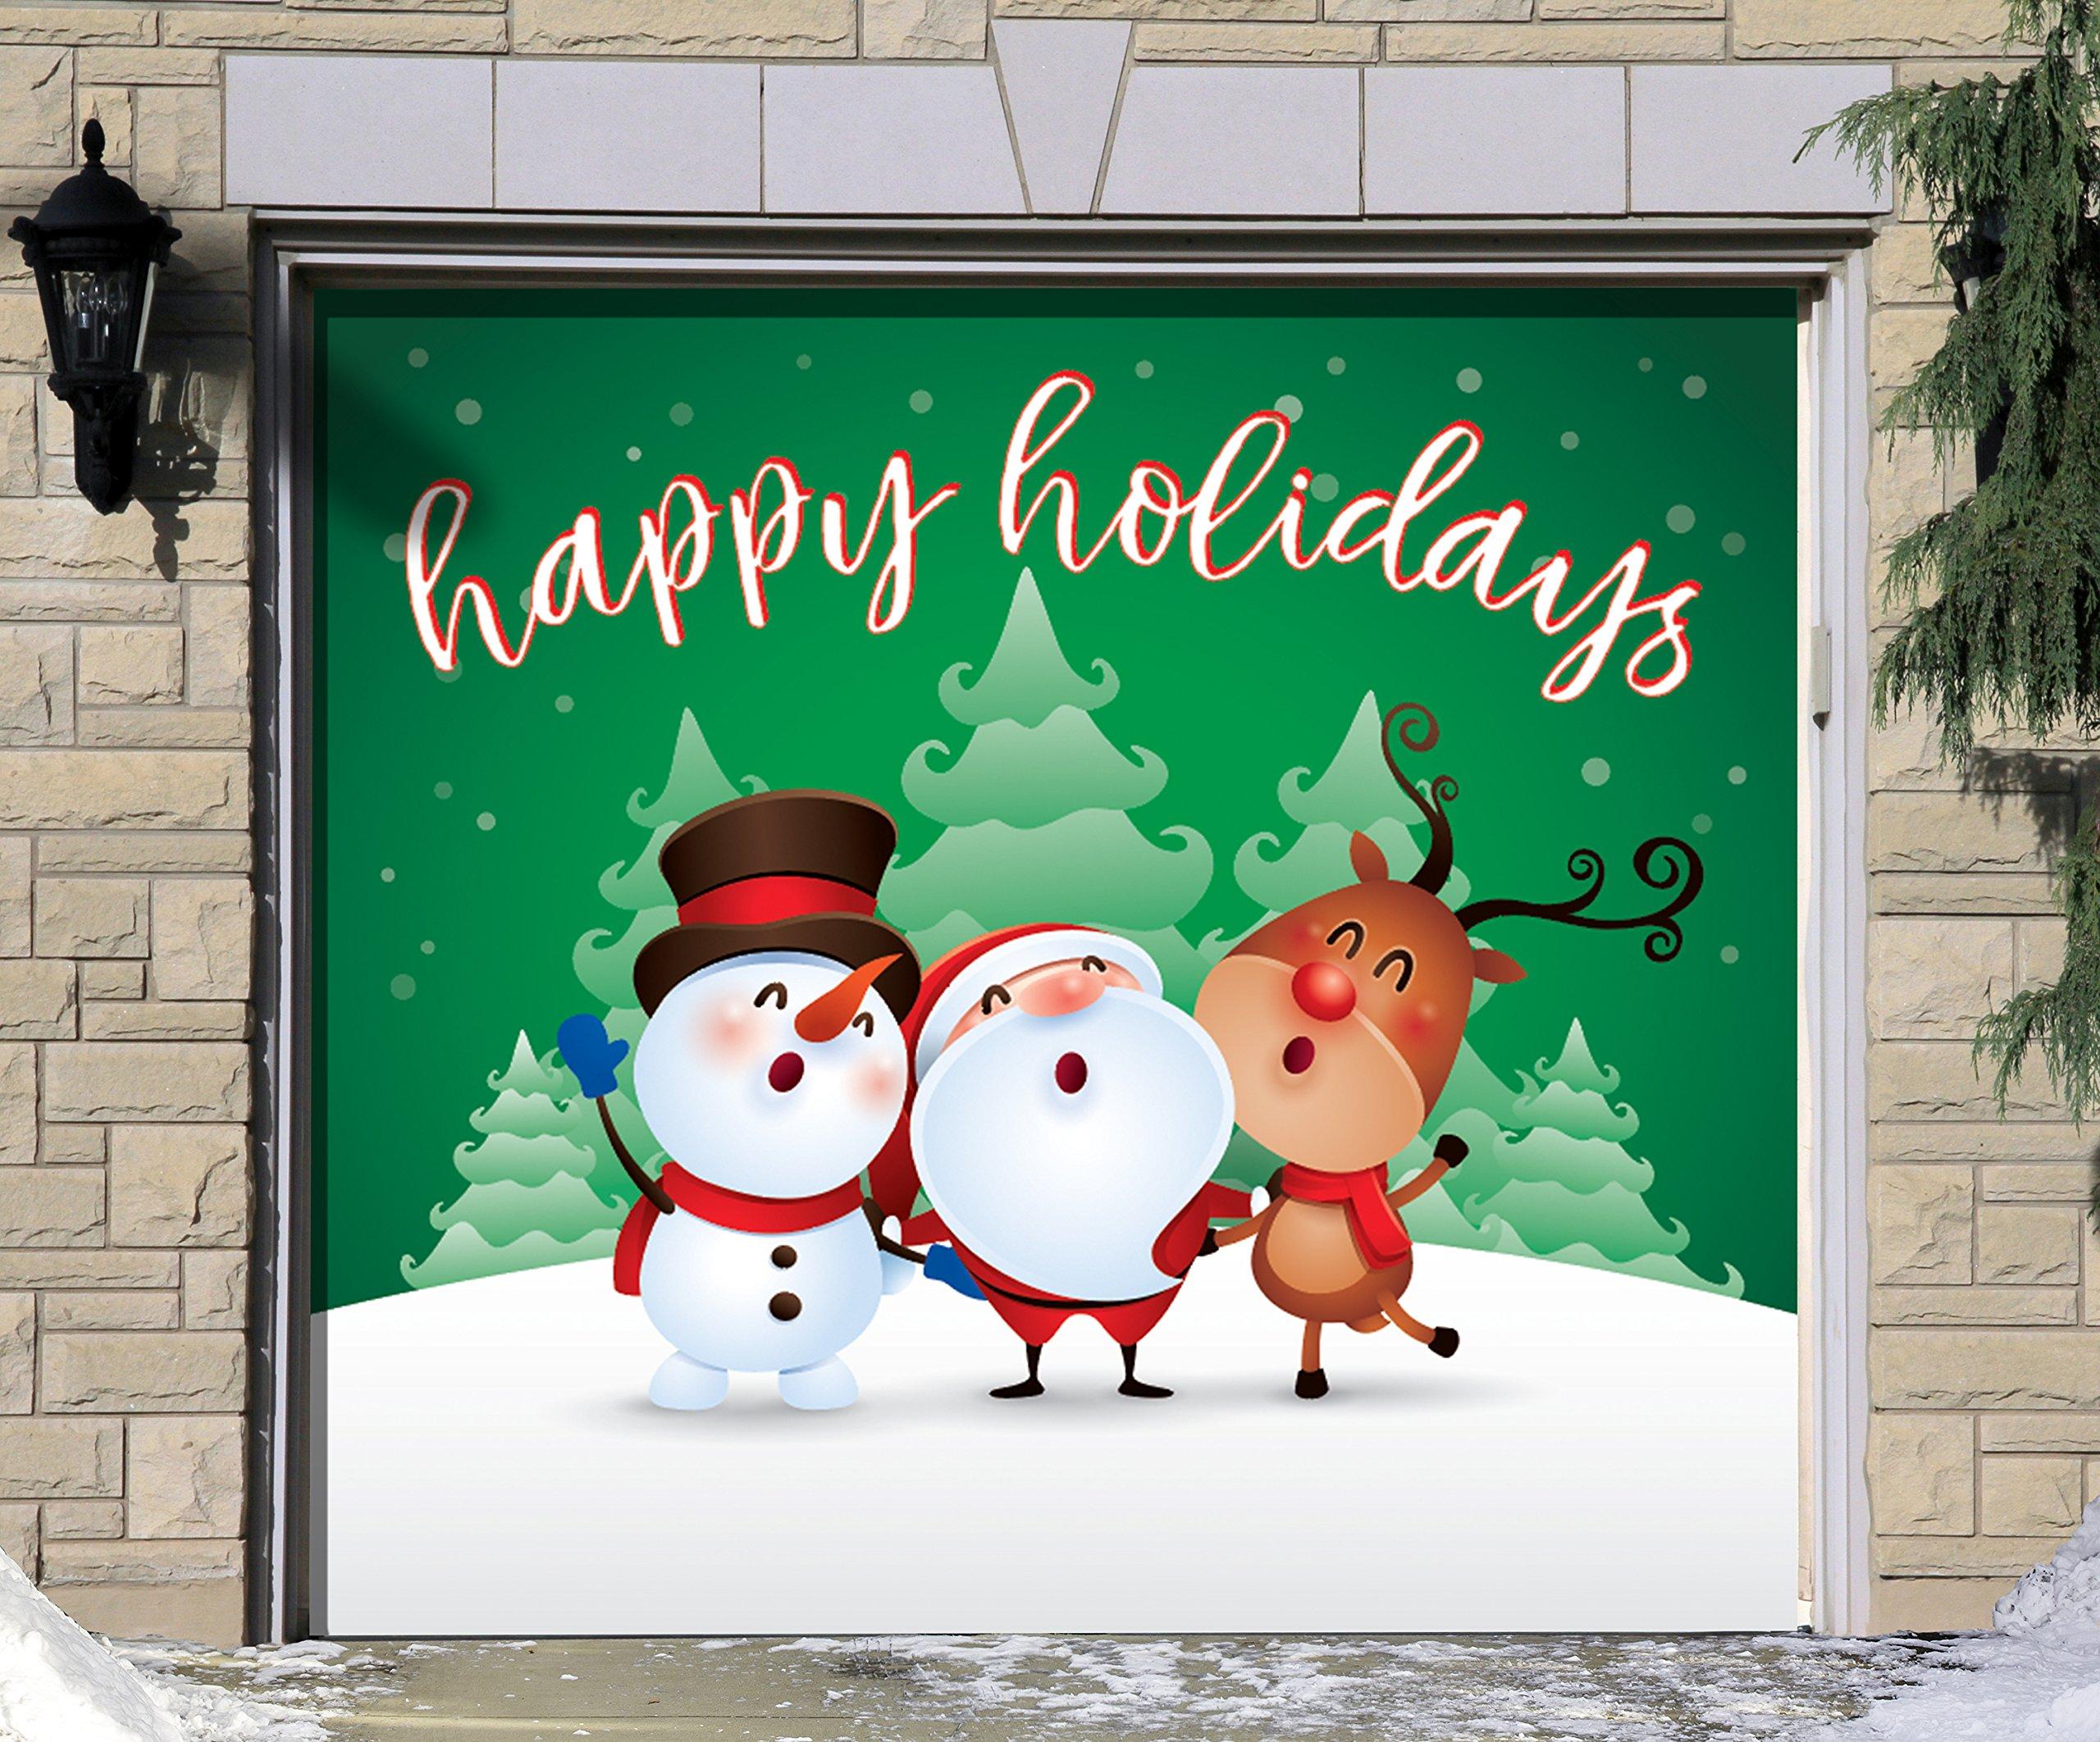 Outdoor Christmas Holiday Garage Door Banner Cover Mural Décoration - Christmas Characters Happy Holidays Winter - Outdoor Christmas Holiday Garage Door Banner Décor Sign 7'x8' -